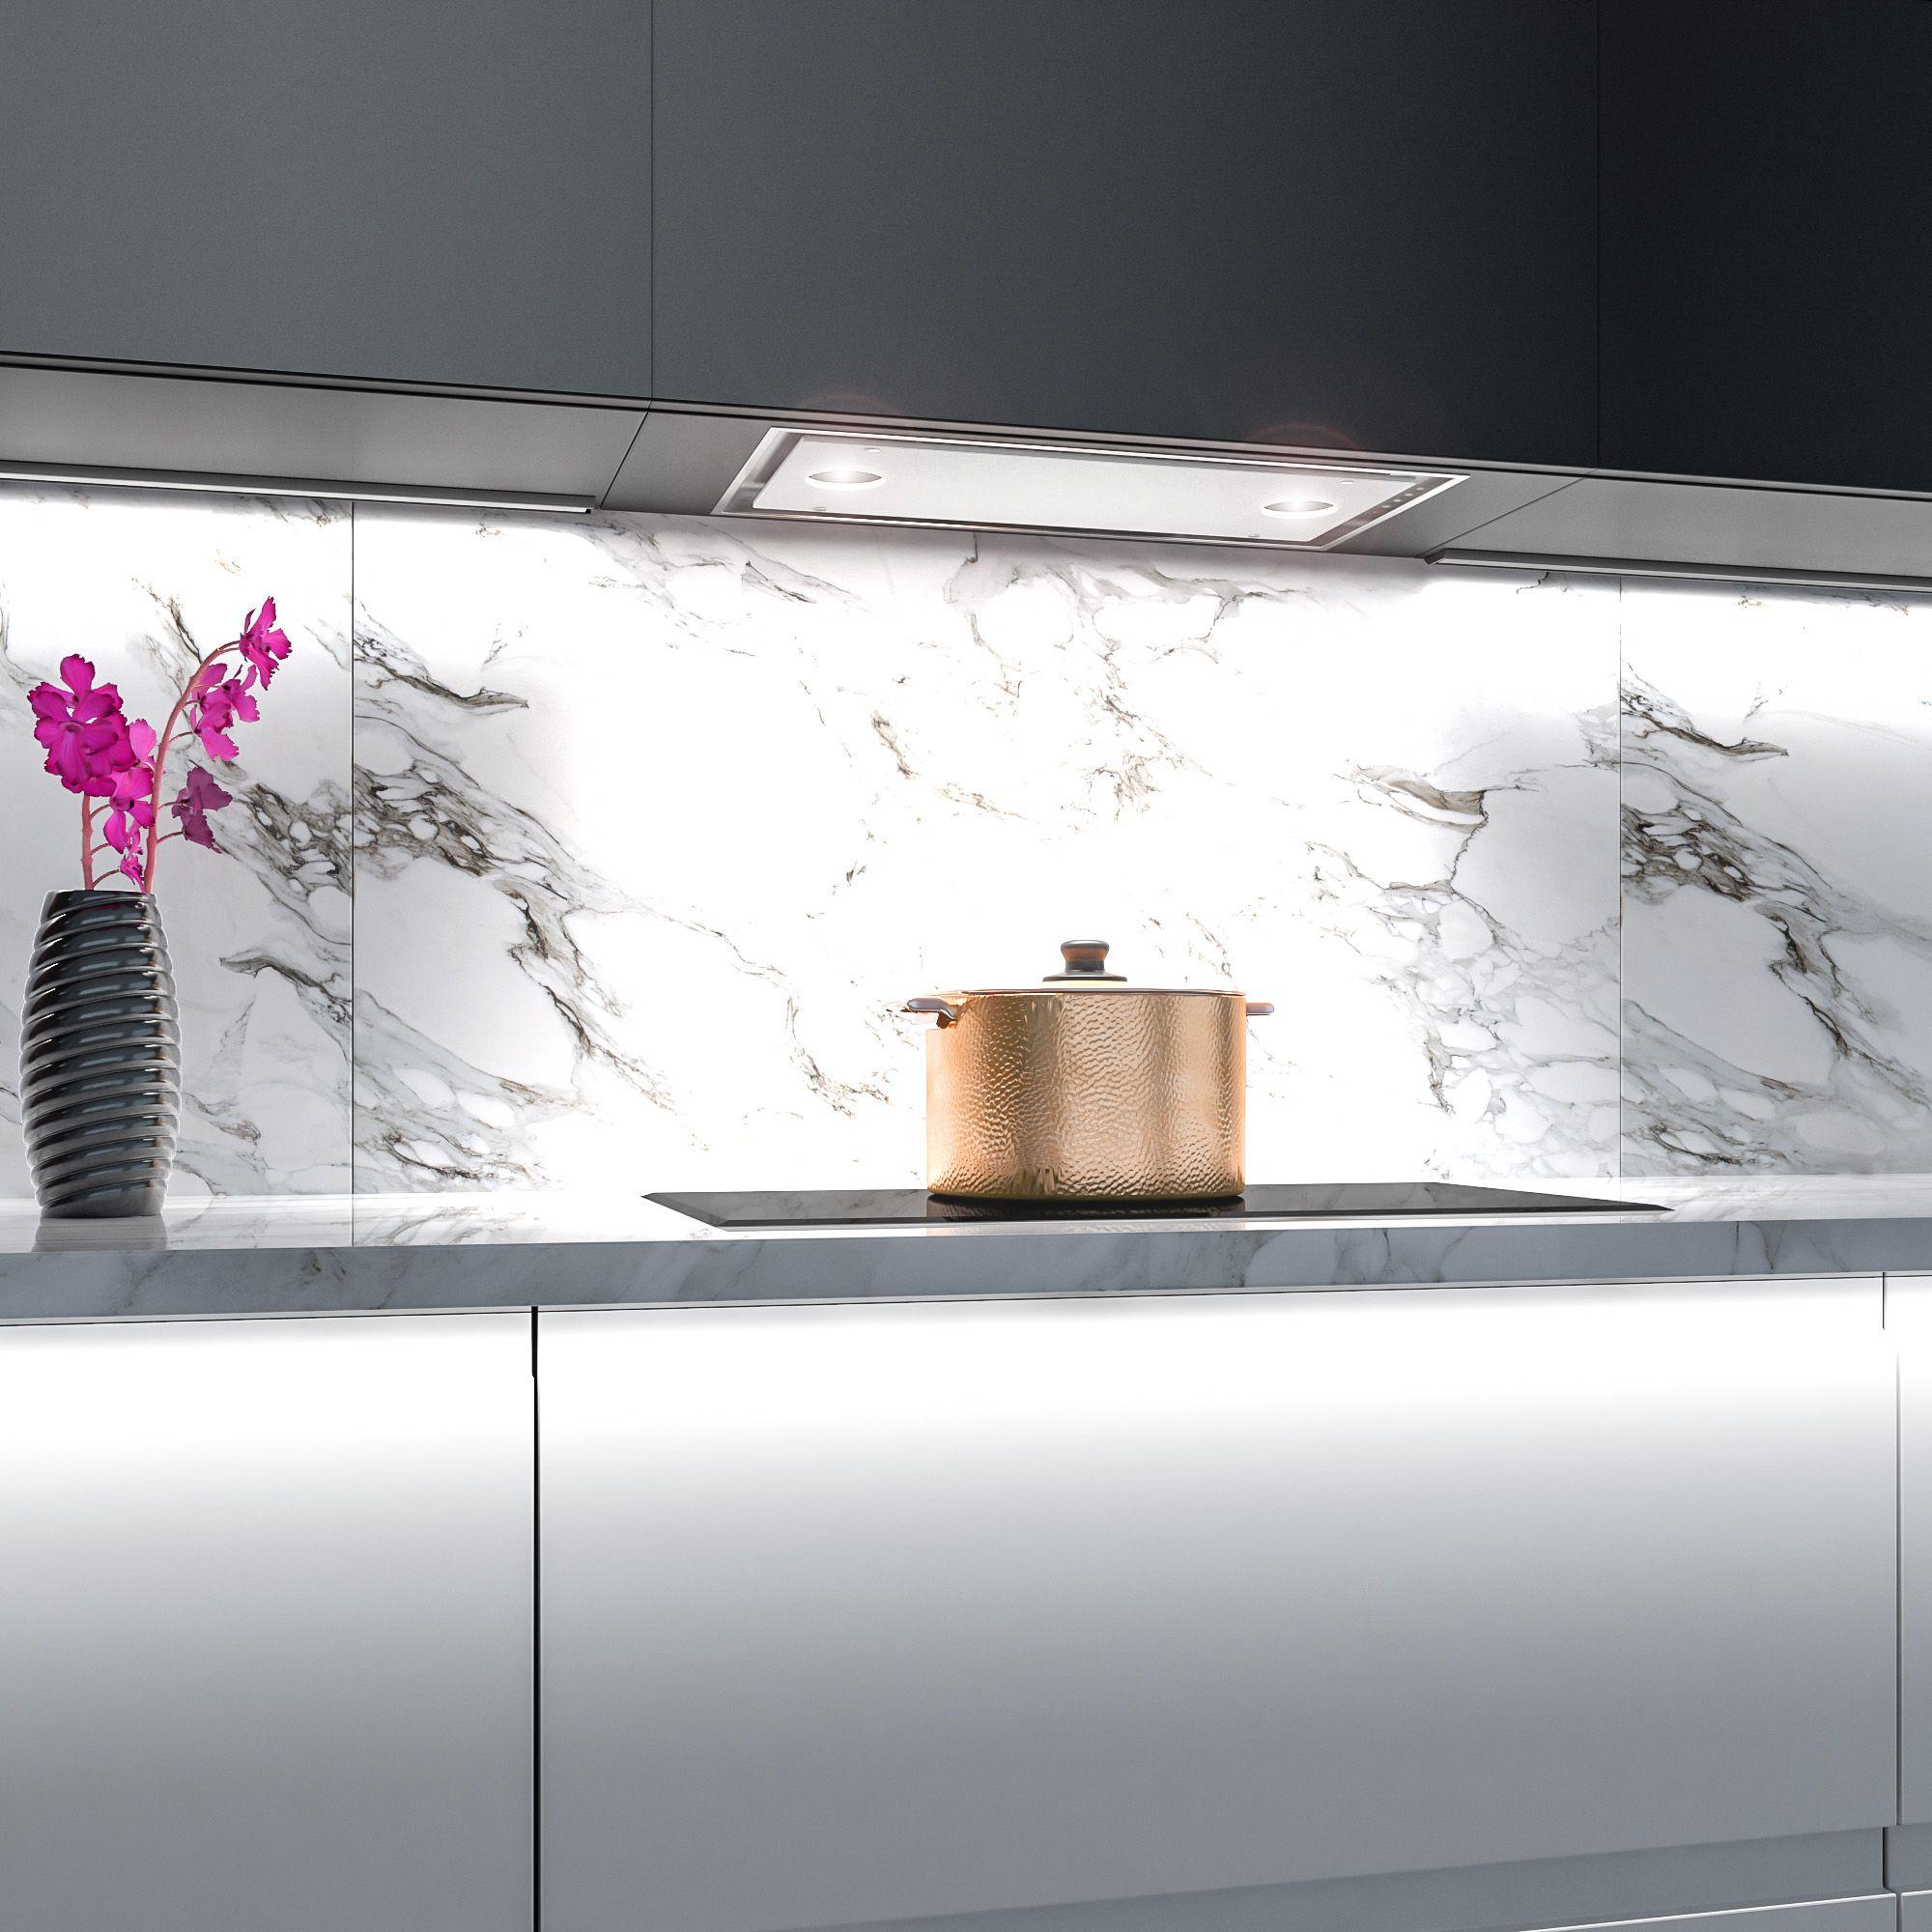 Futuro Futuro 24 Inch Raccolta Insert Range Hood In 2020 Kitchen Ventilation Kitchen Fan Kitchen Hoods